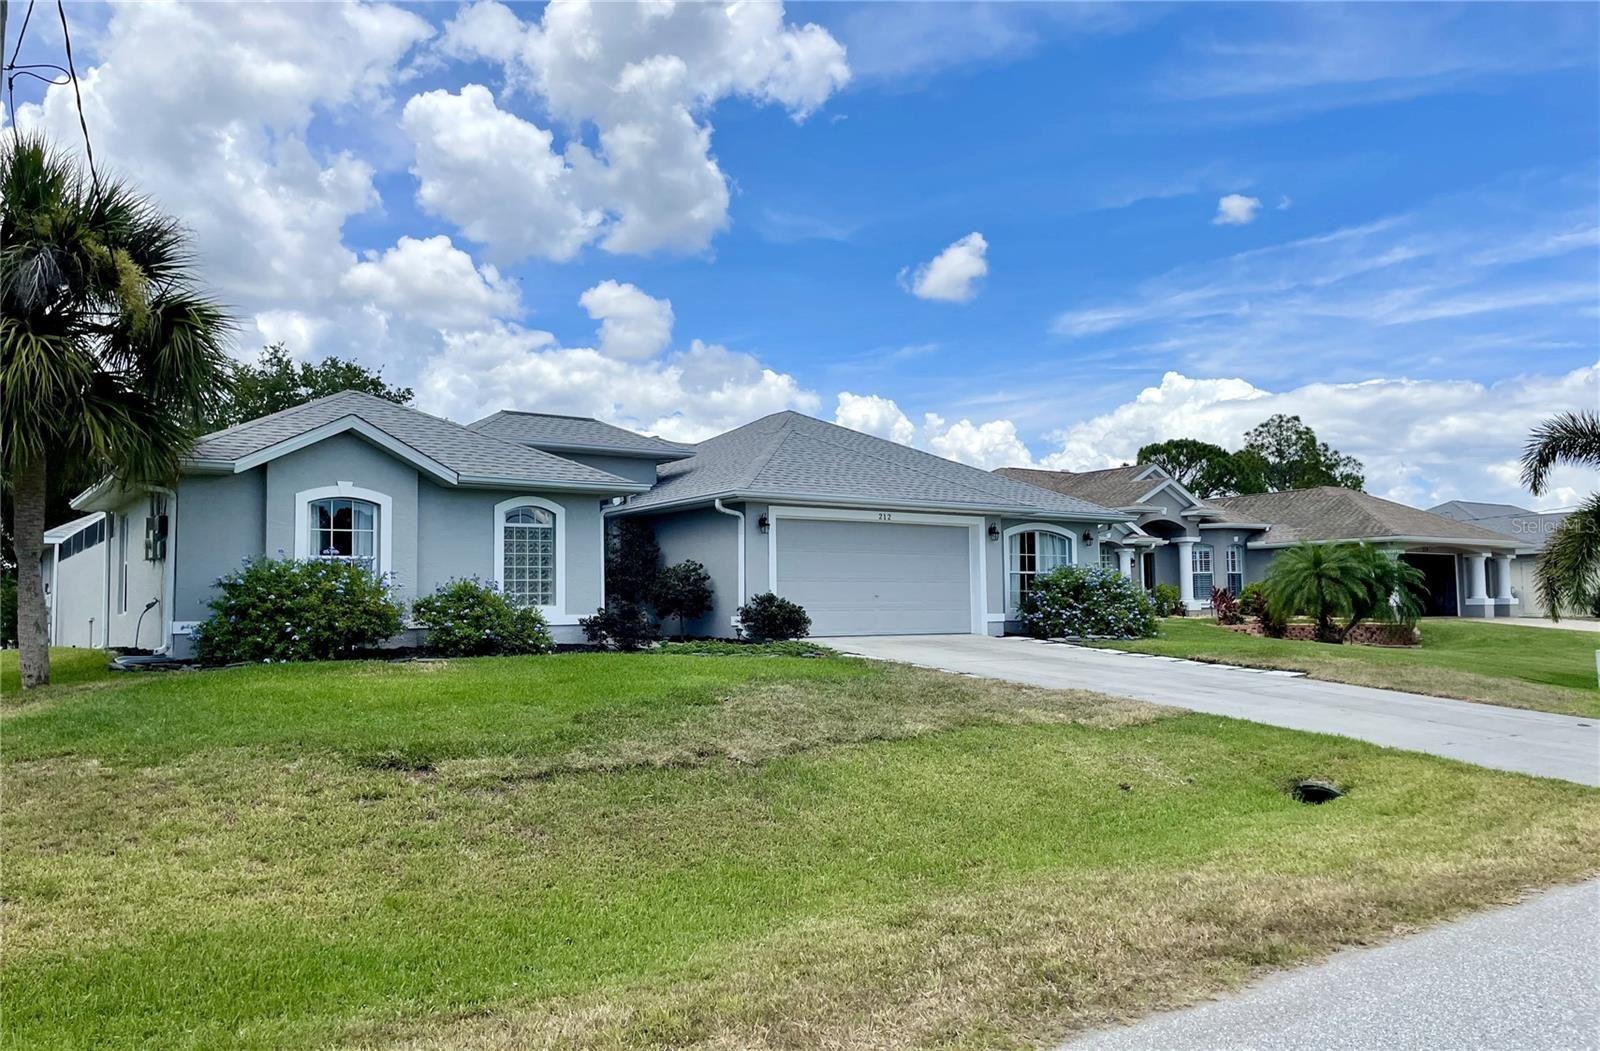 212 MARKER RD, Rotonda, FL 33947 - MLS#: D6119214